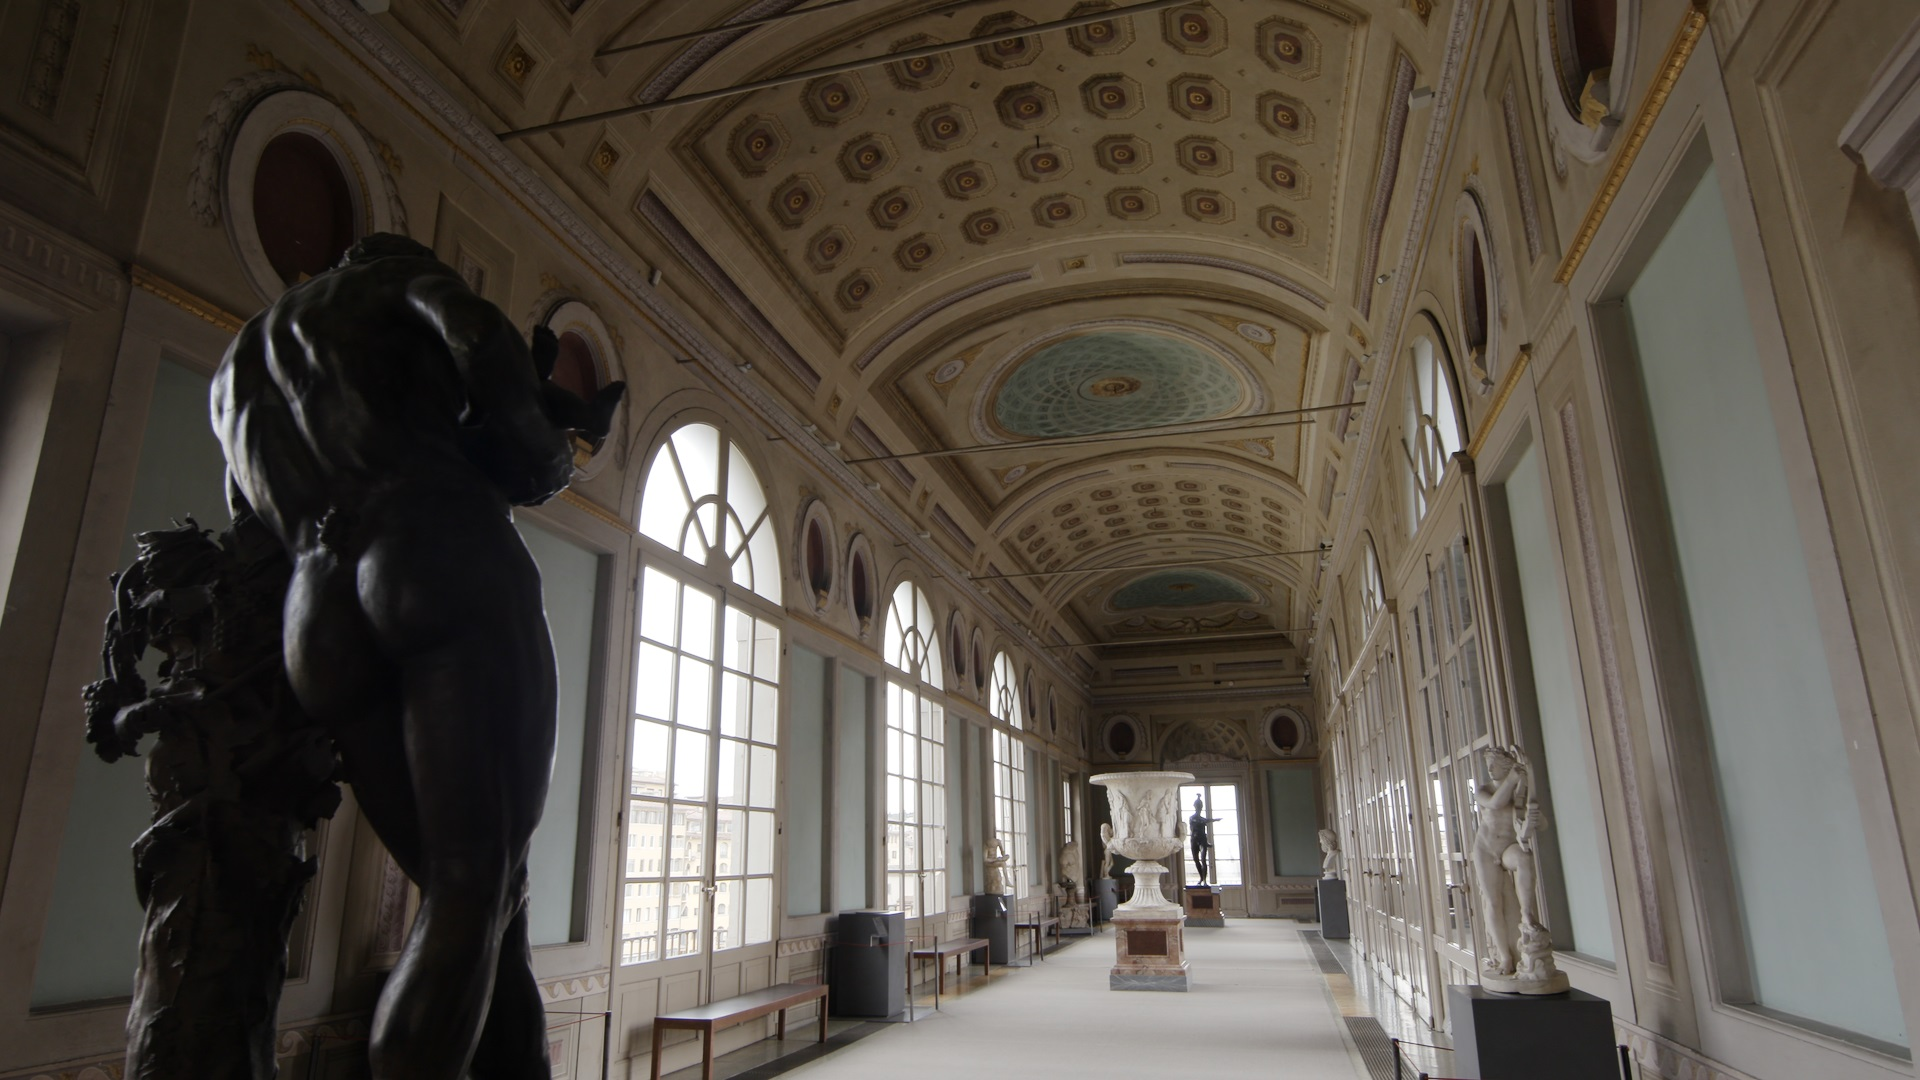 Galleria degli Uffizi, Firenze